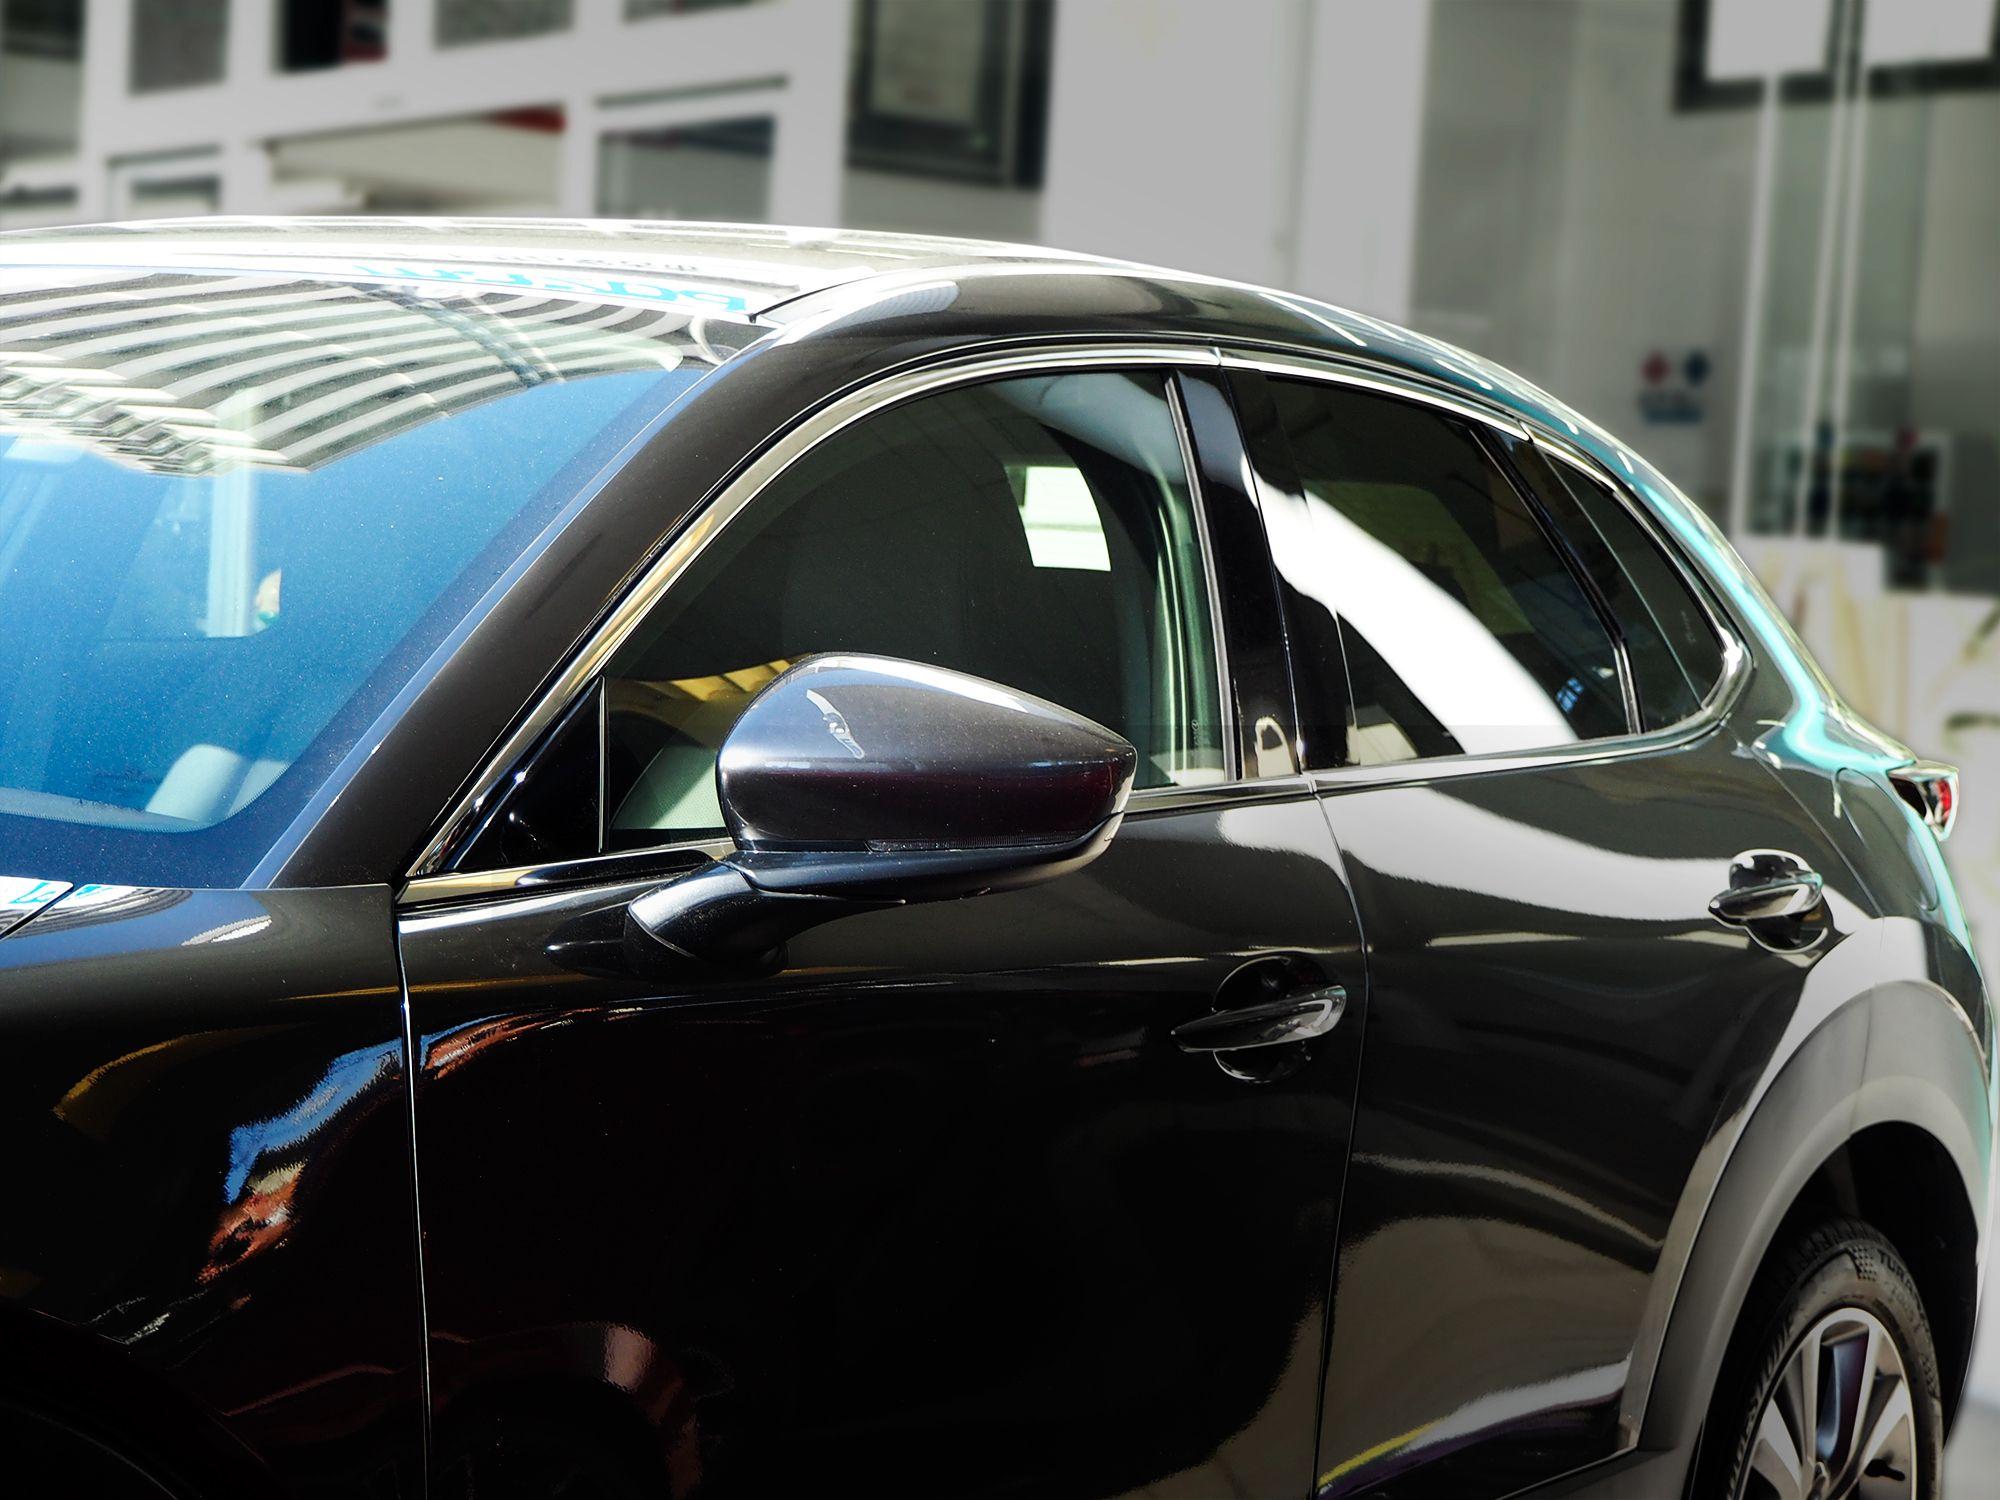 Cx 30 ウィンドウトリム 鏡面仕上げ 6p アクリルバイザー非装着車専用 高品質ステンレス製 マツダ Mazda Cx30 パーツ カスタム ドレスアップ エアロ Dm8p Dmep 専用 エアロ 鏡面仕上げ バイザー